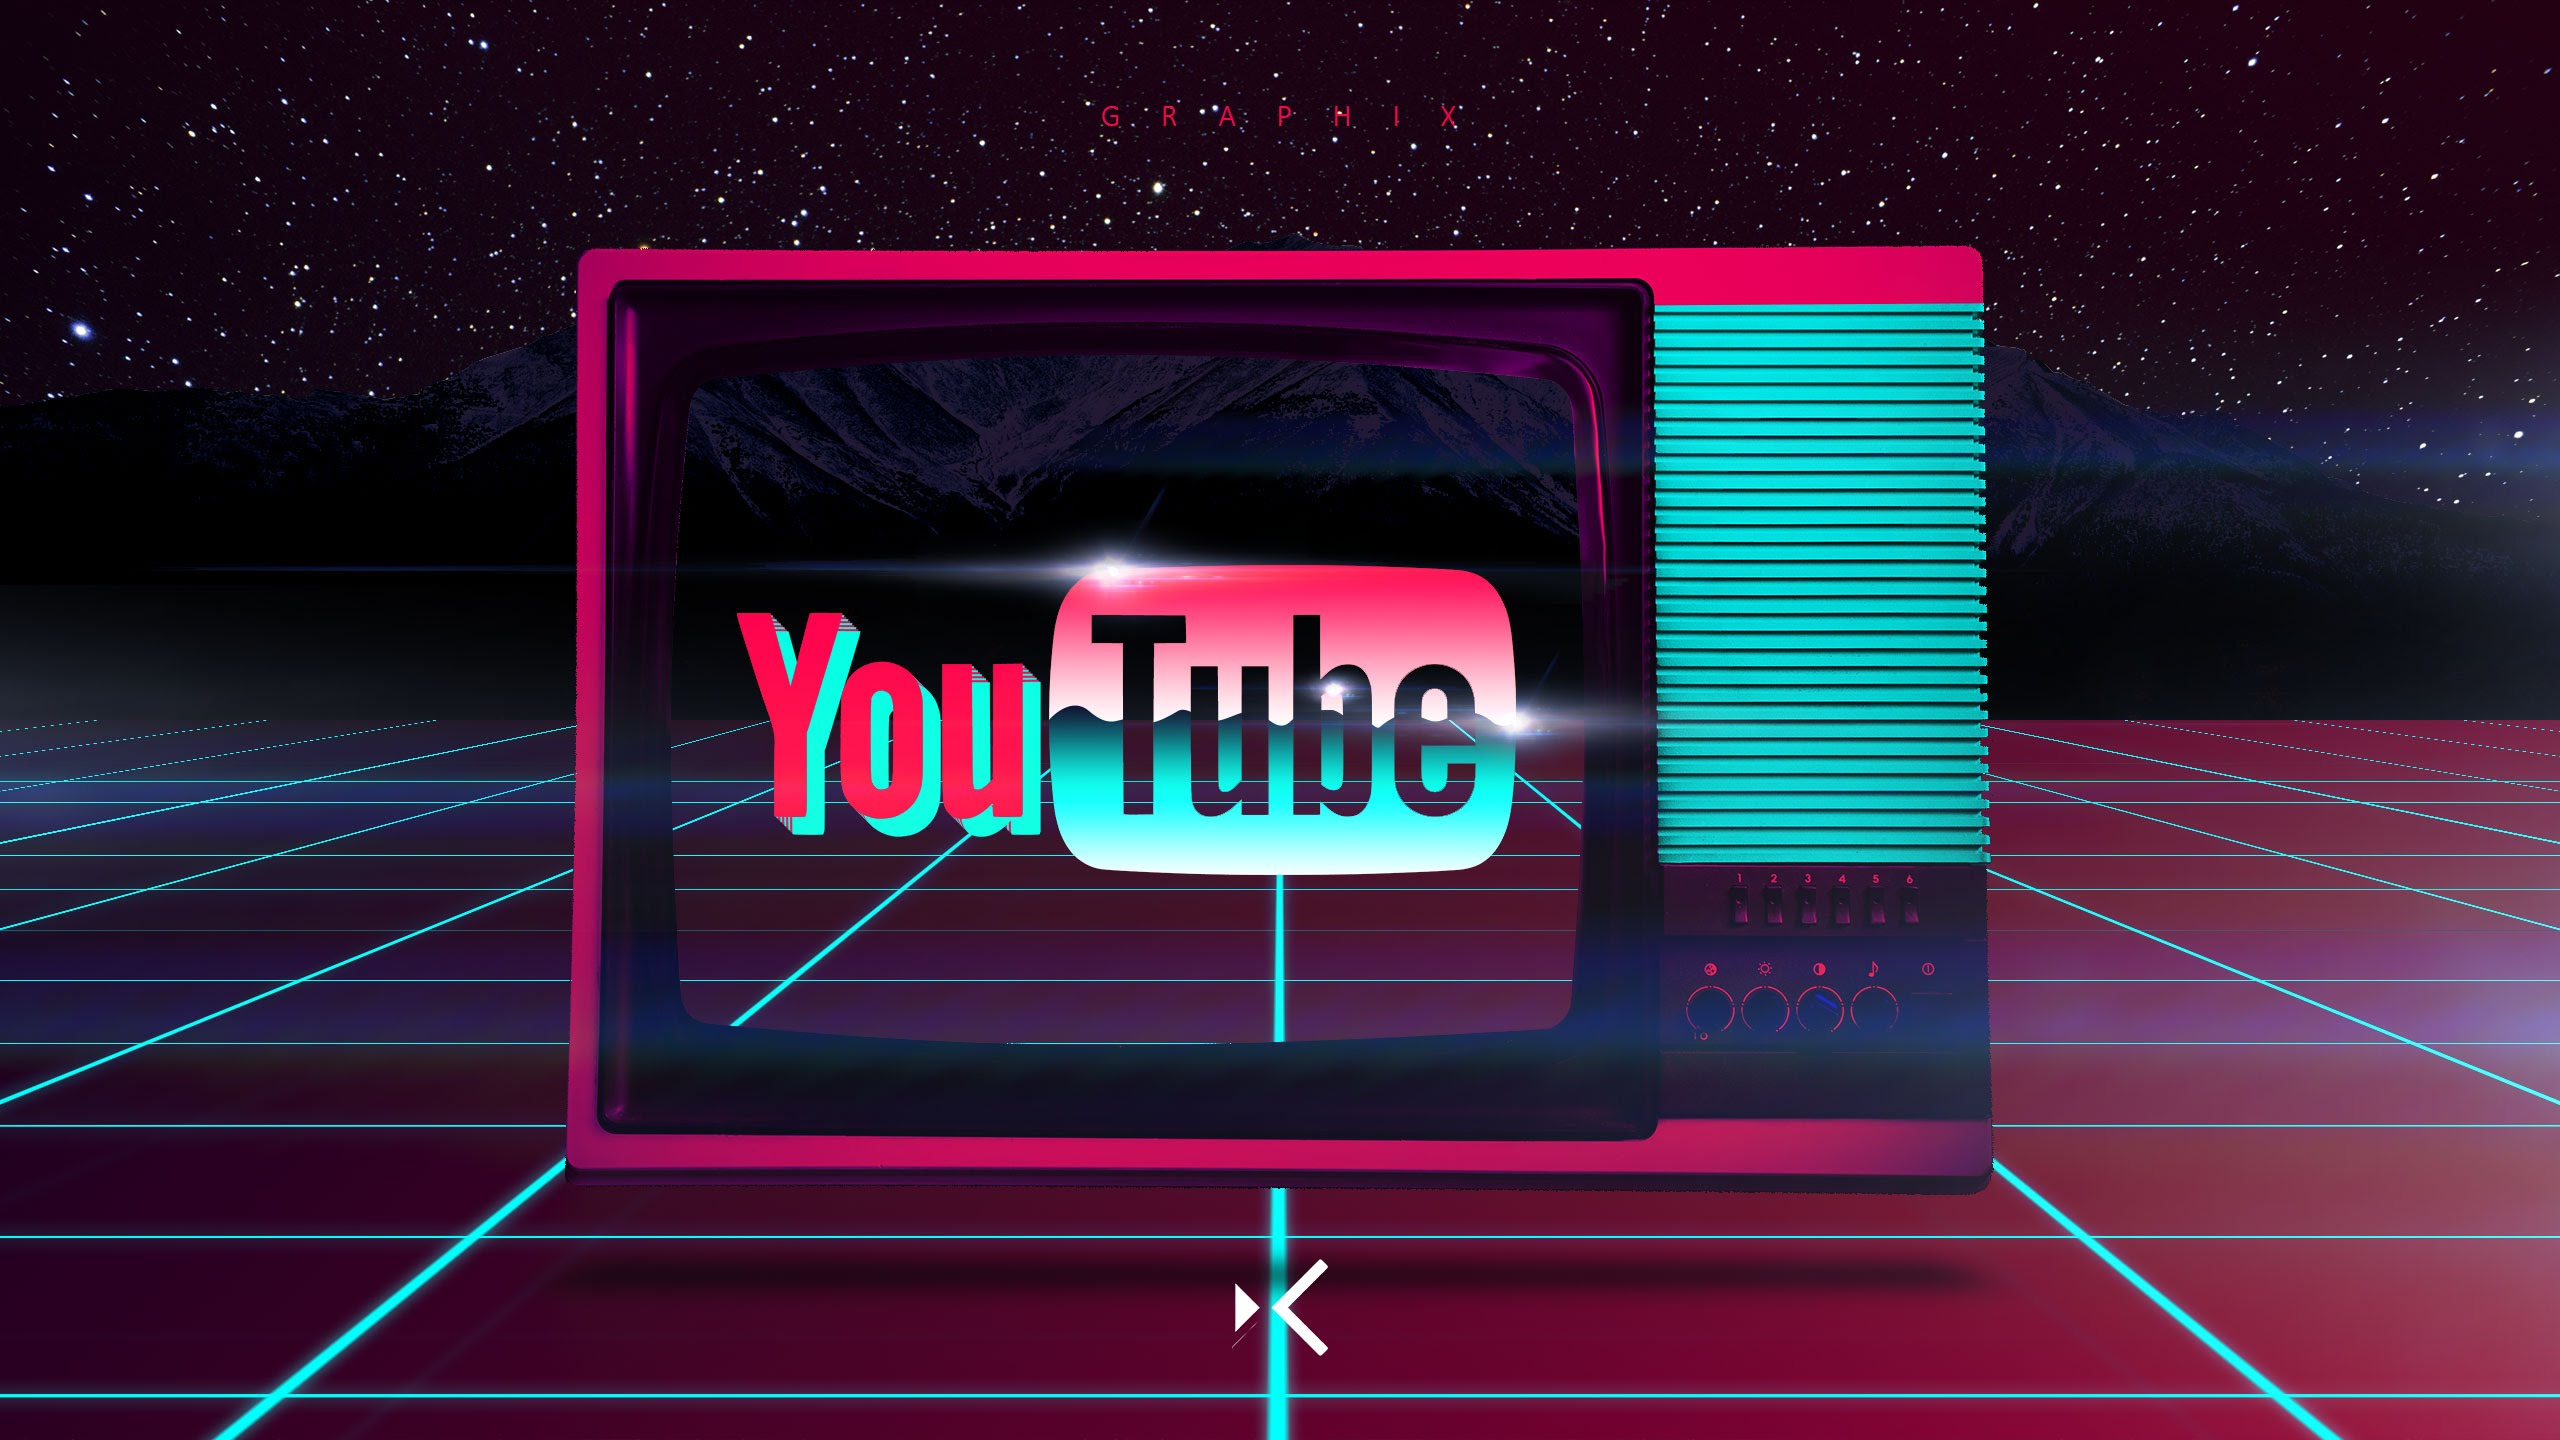 Fall Halloween Computer Wallpaper Youtube Wallpapers Hd Pixelstalk Net